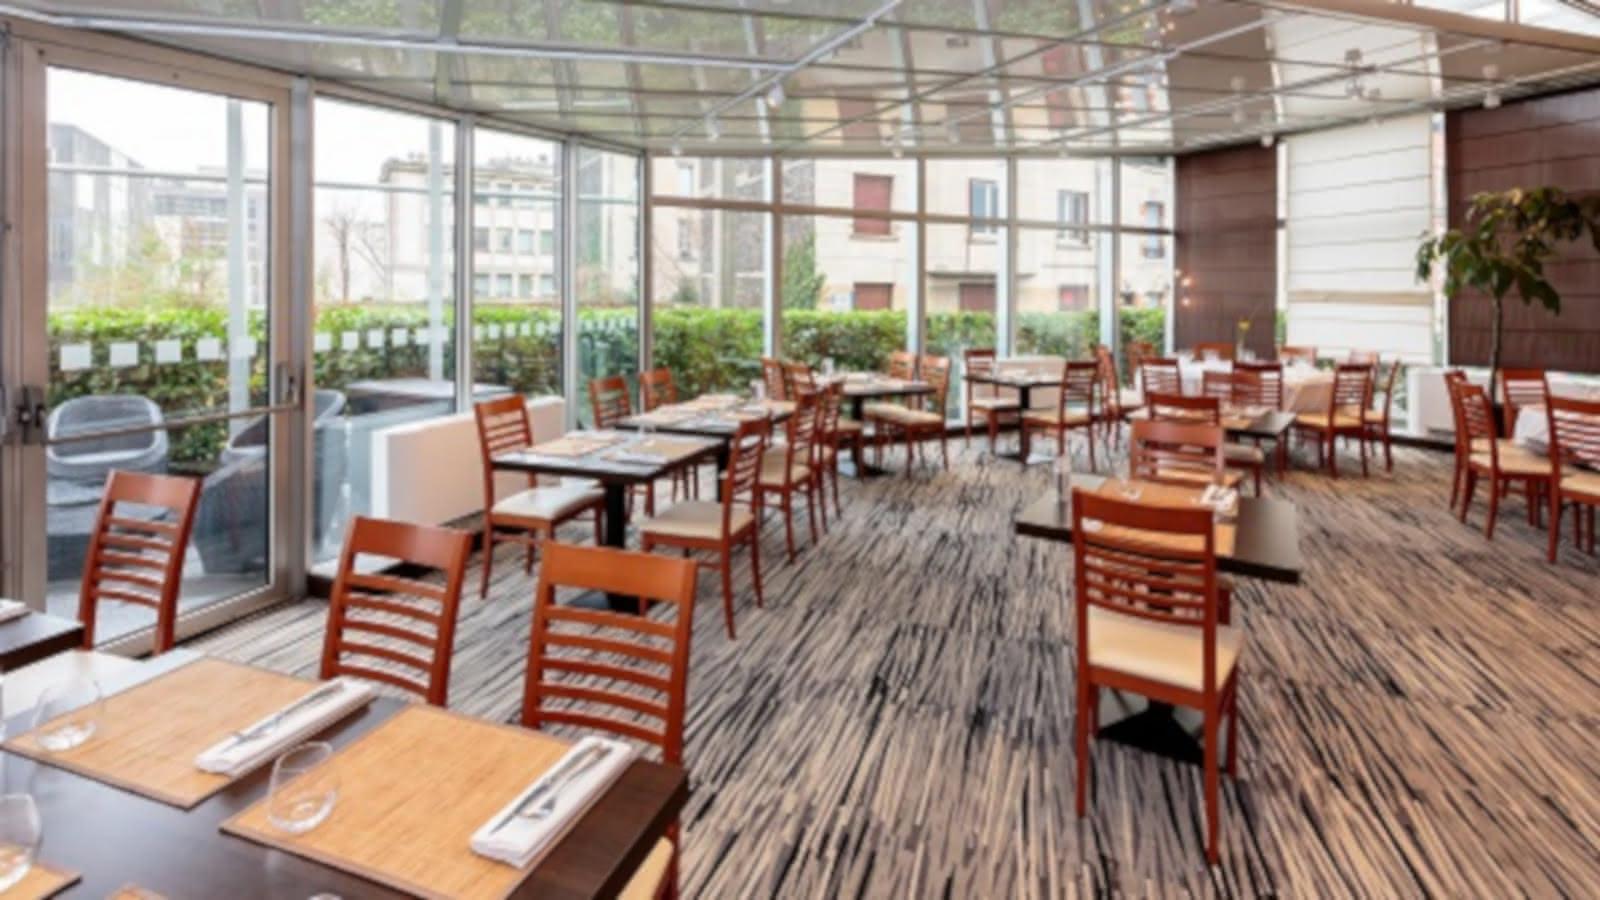 Salle - Restaurant le Gergovia